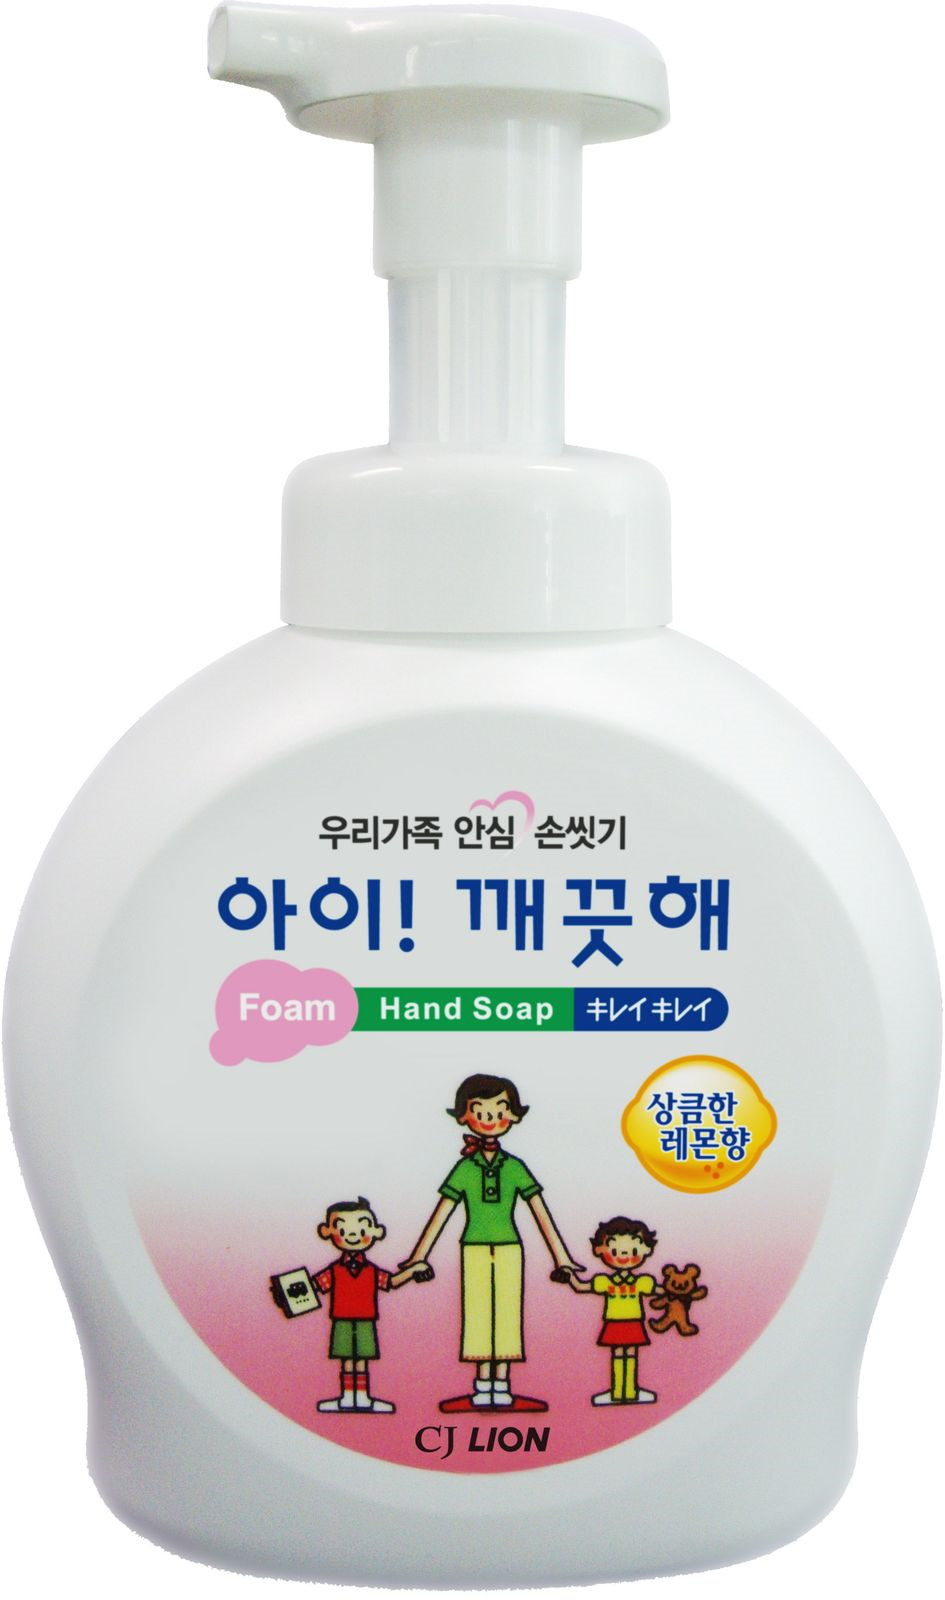 Жидкое мыло CJ Lion Ai-Kekute, с ароматом лимона, 490 мл